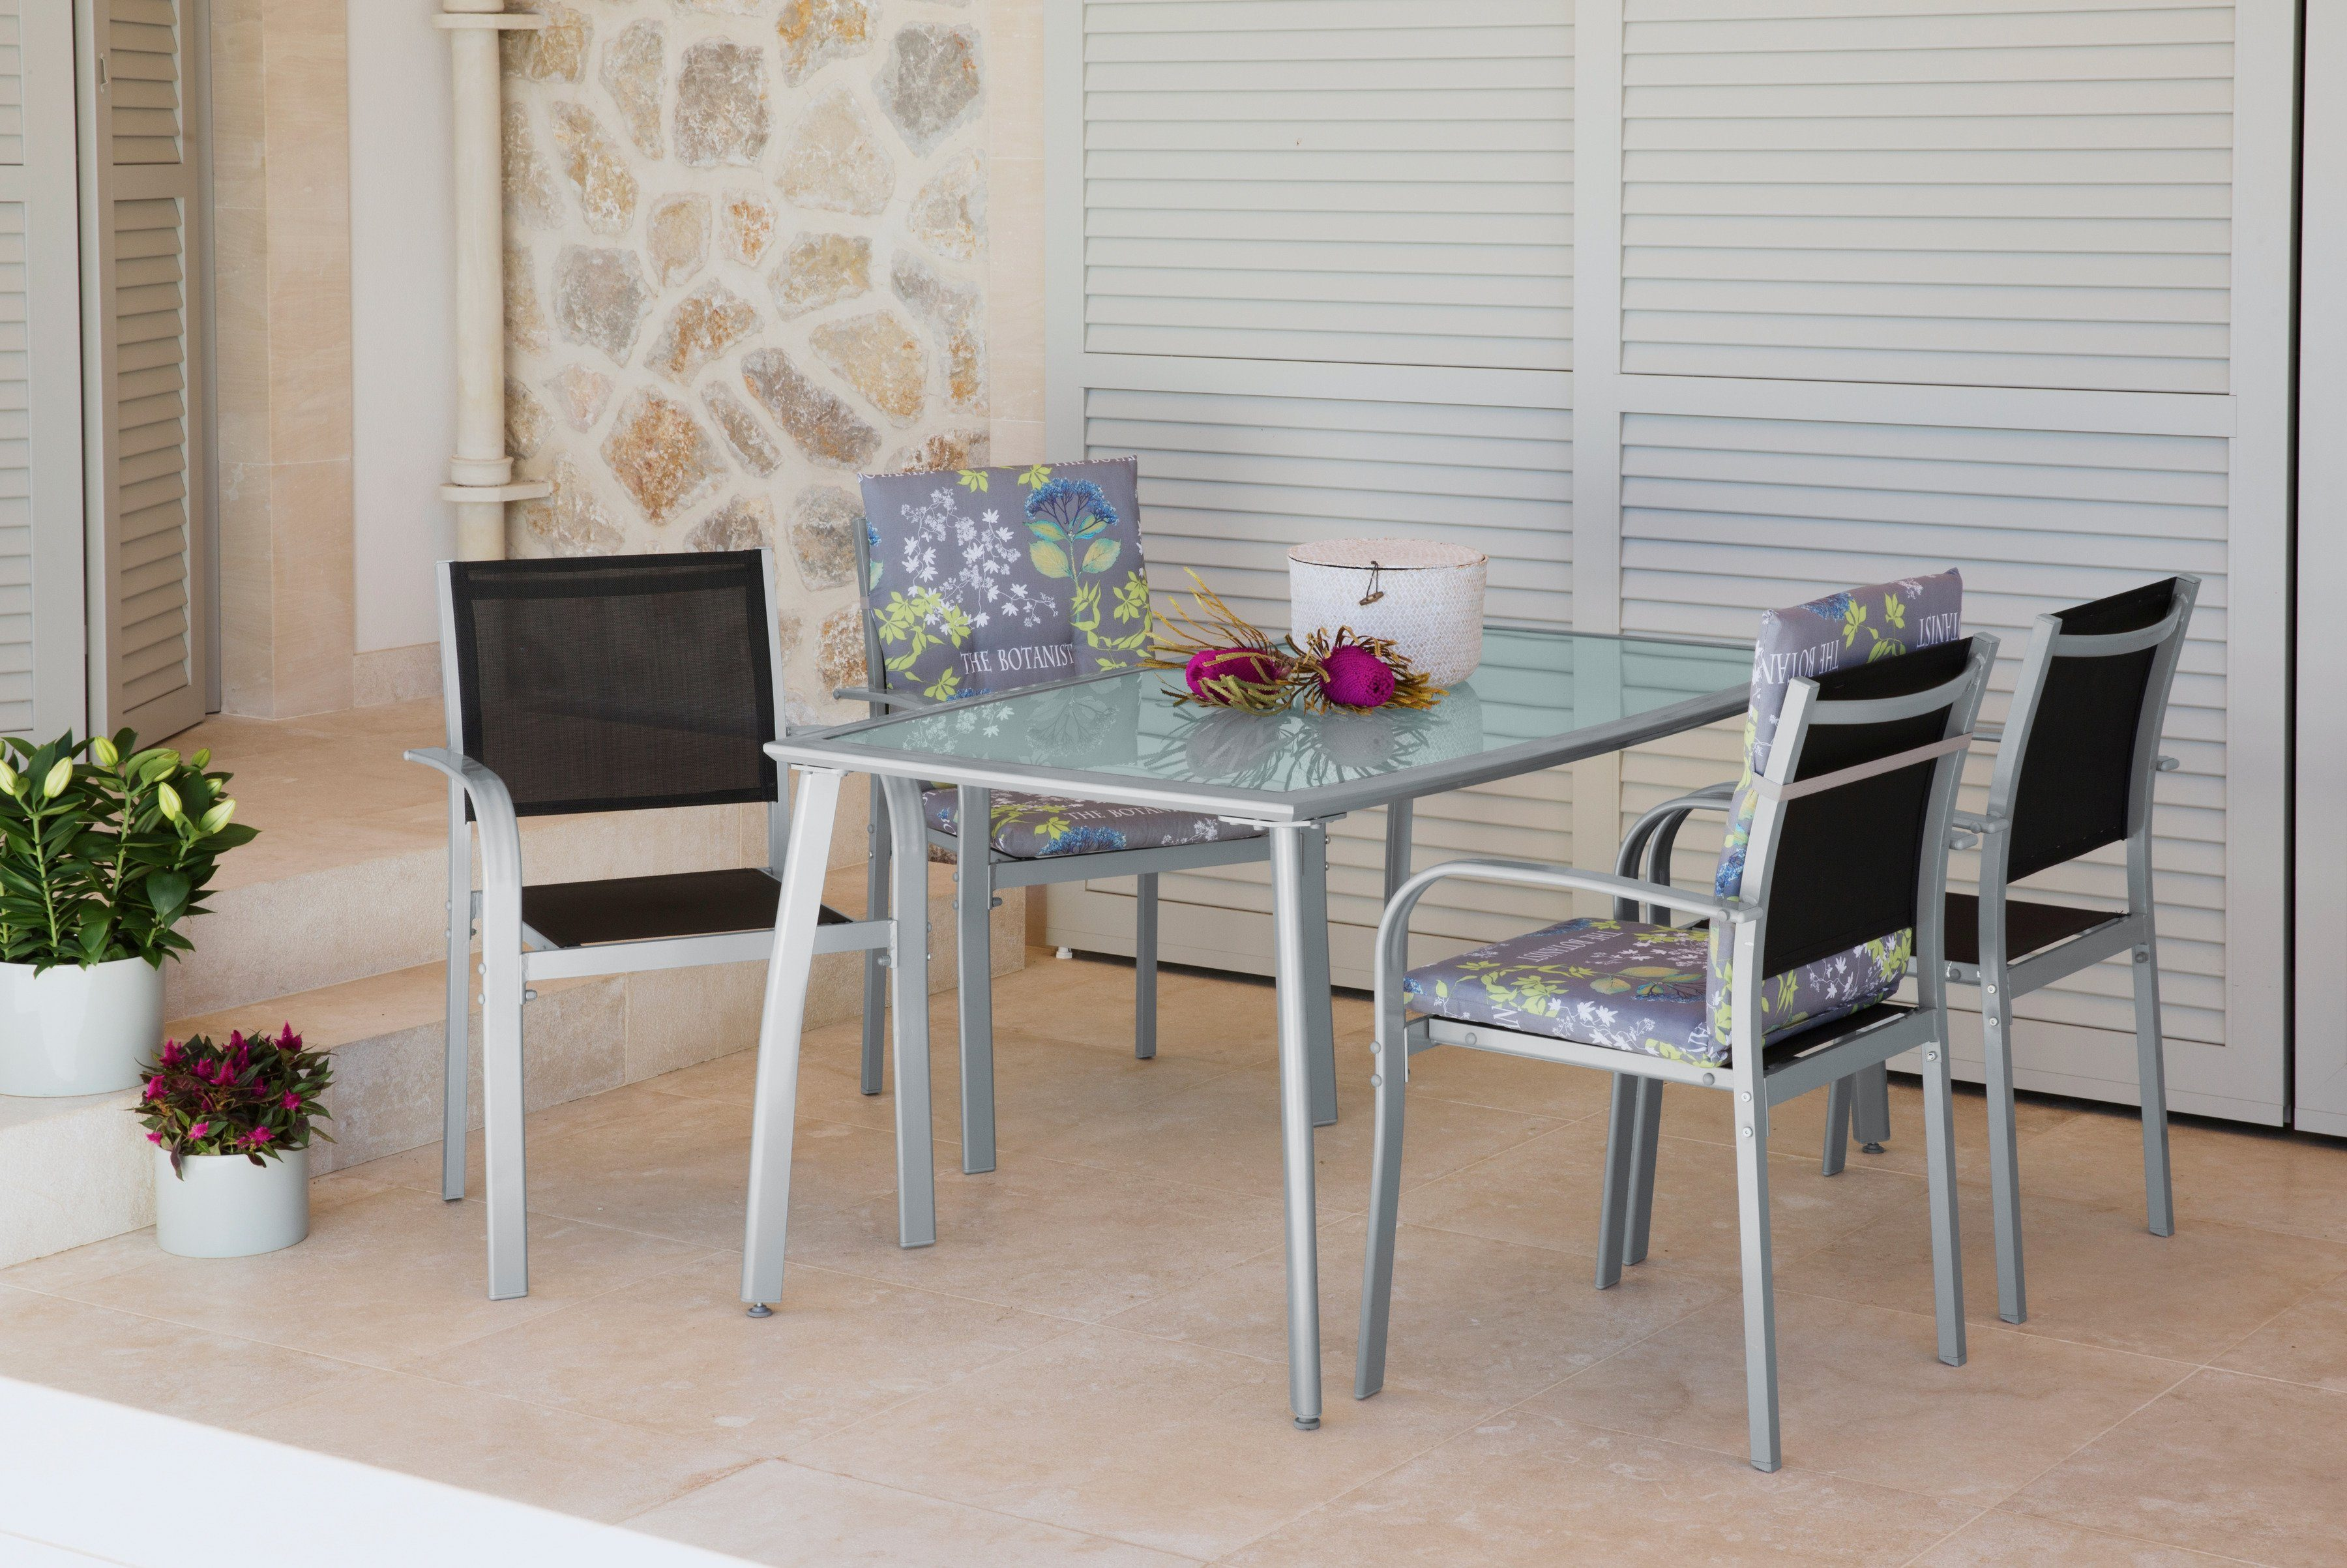 5-tgl. Gartenmöbelset »Lima«, 4 Stapelsessel, Tisch 150x90 cm, Alu/Textil, schwarz